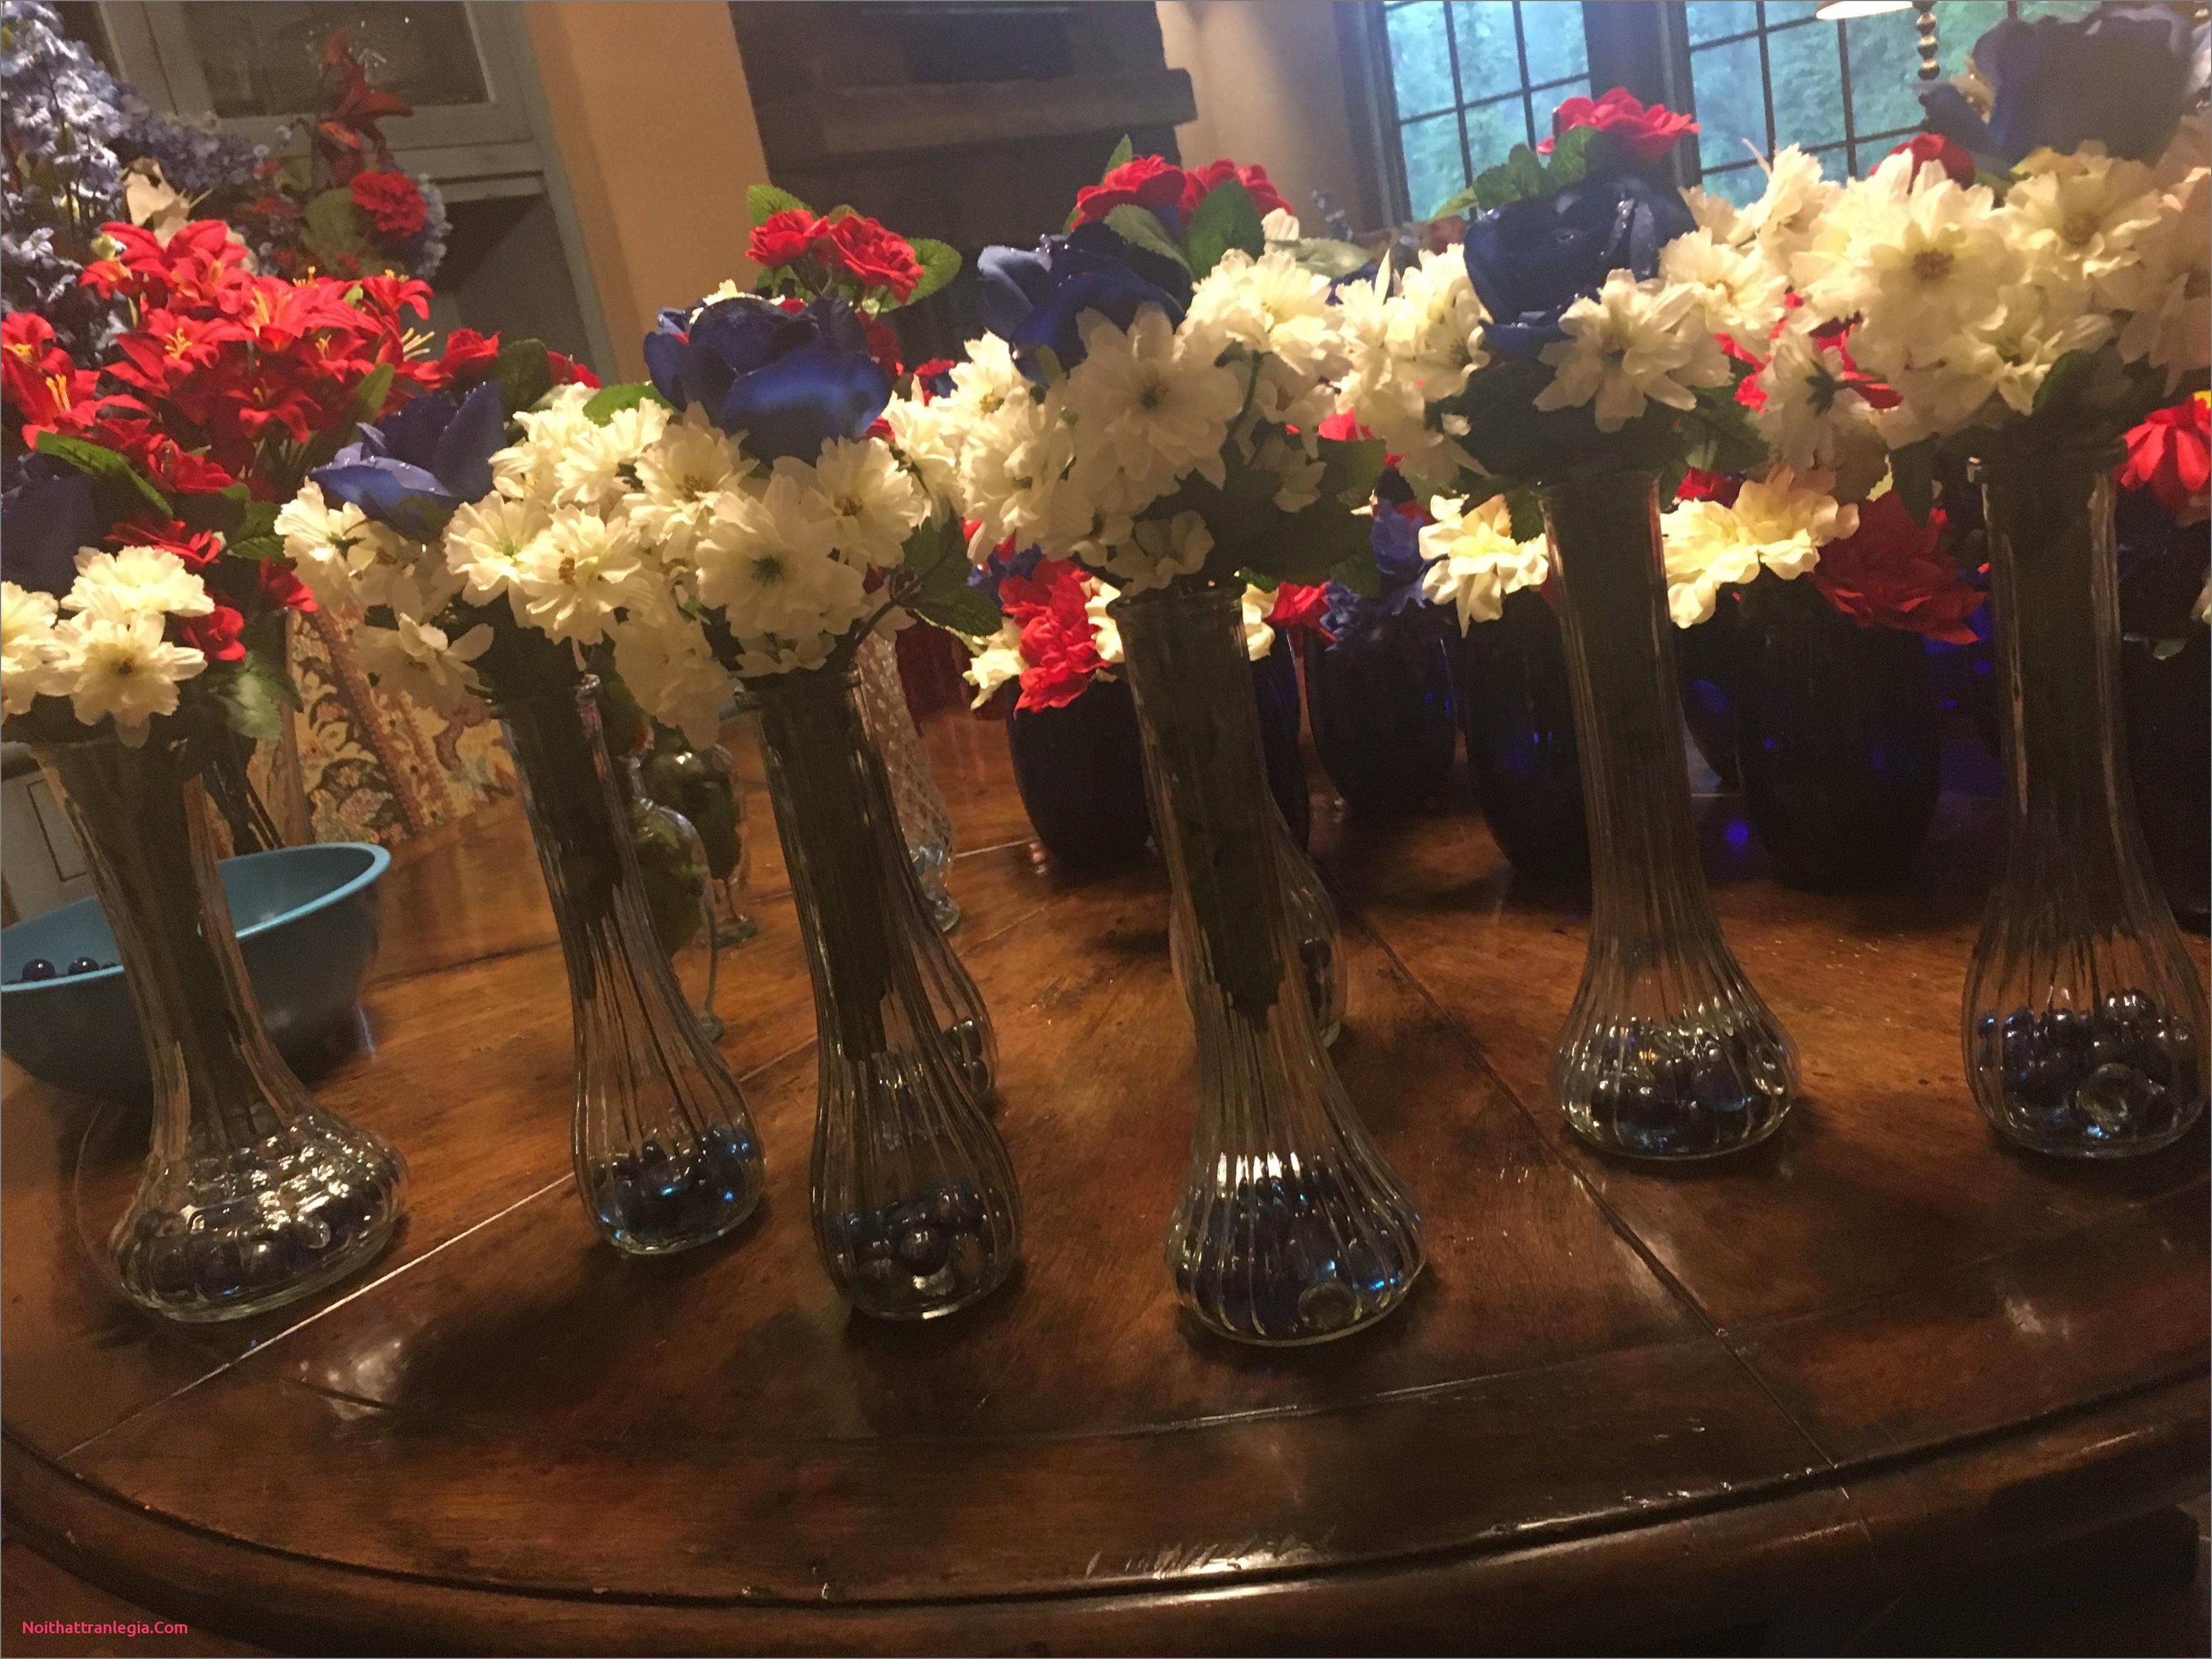 27 attractive Eiffel tower Vases wholesale 2021 free download eiffel tower vases wholesale of 20 wedding vases noithattranlegia vases design with decoration line luxury dollar tree wedding decorations awesome h vases dollar vase i 0d